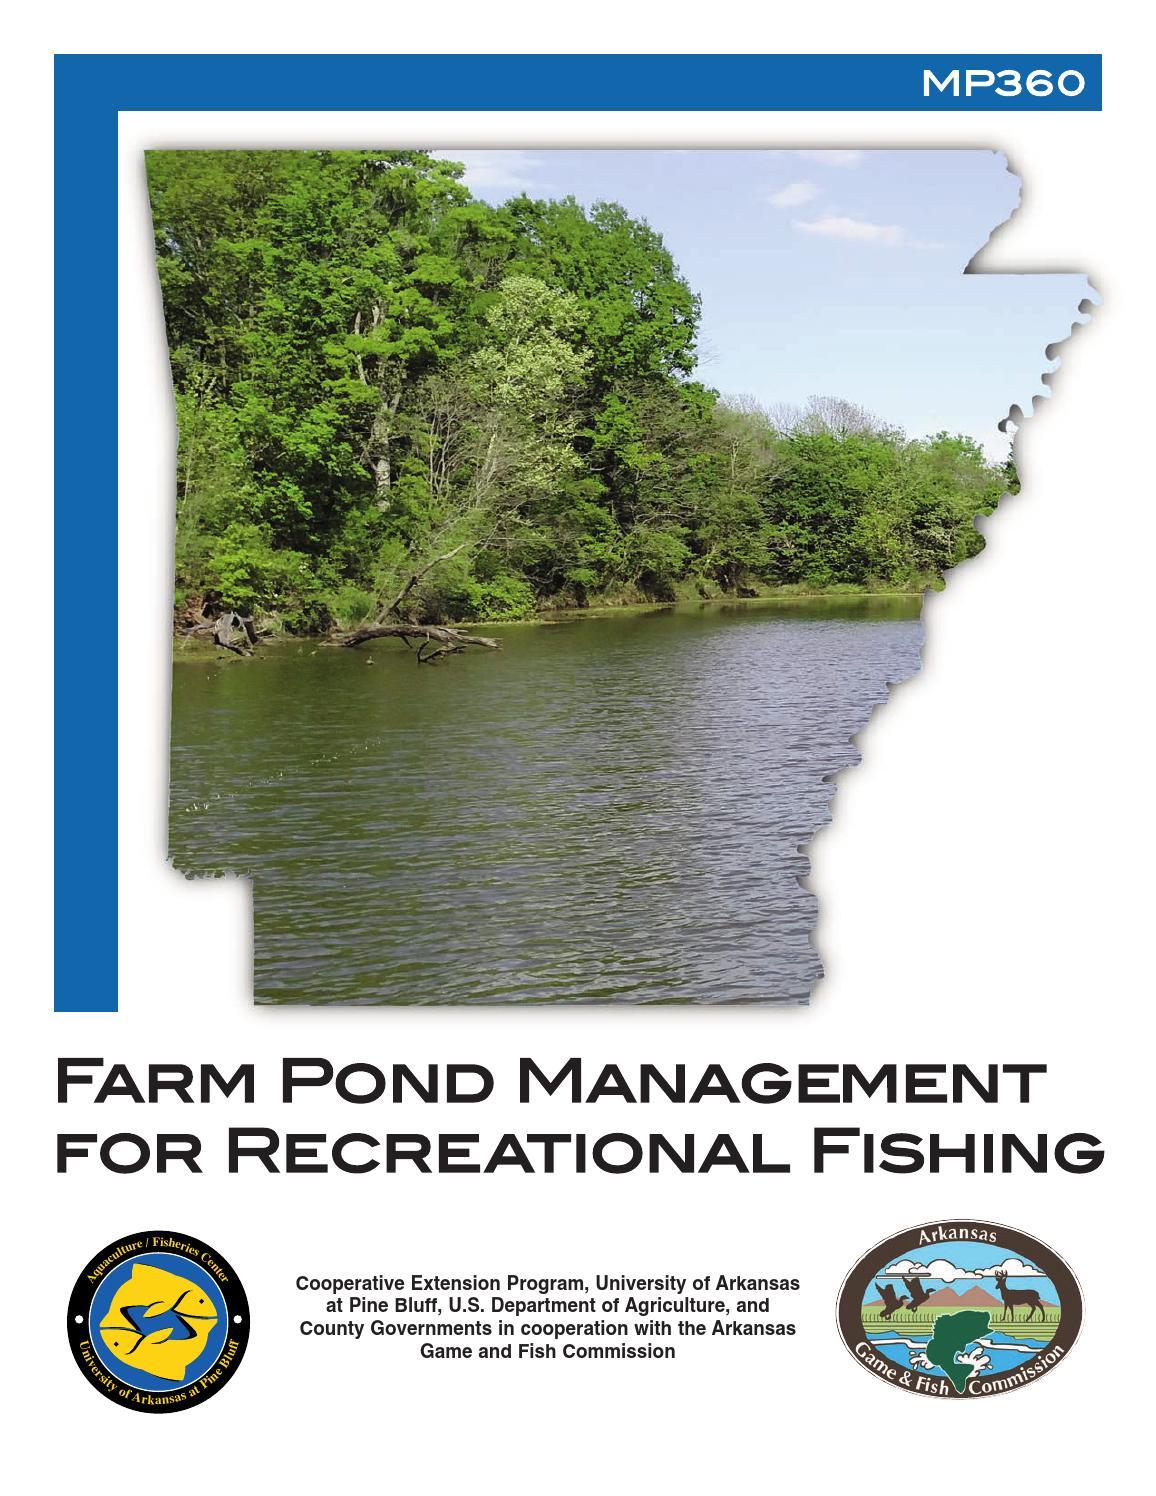 Farm Pond Management Recreational Fishing